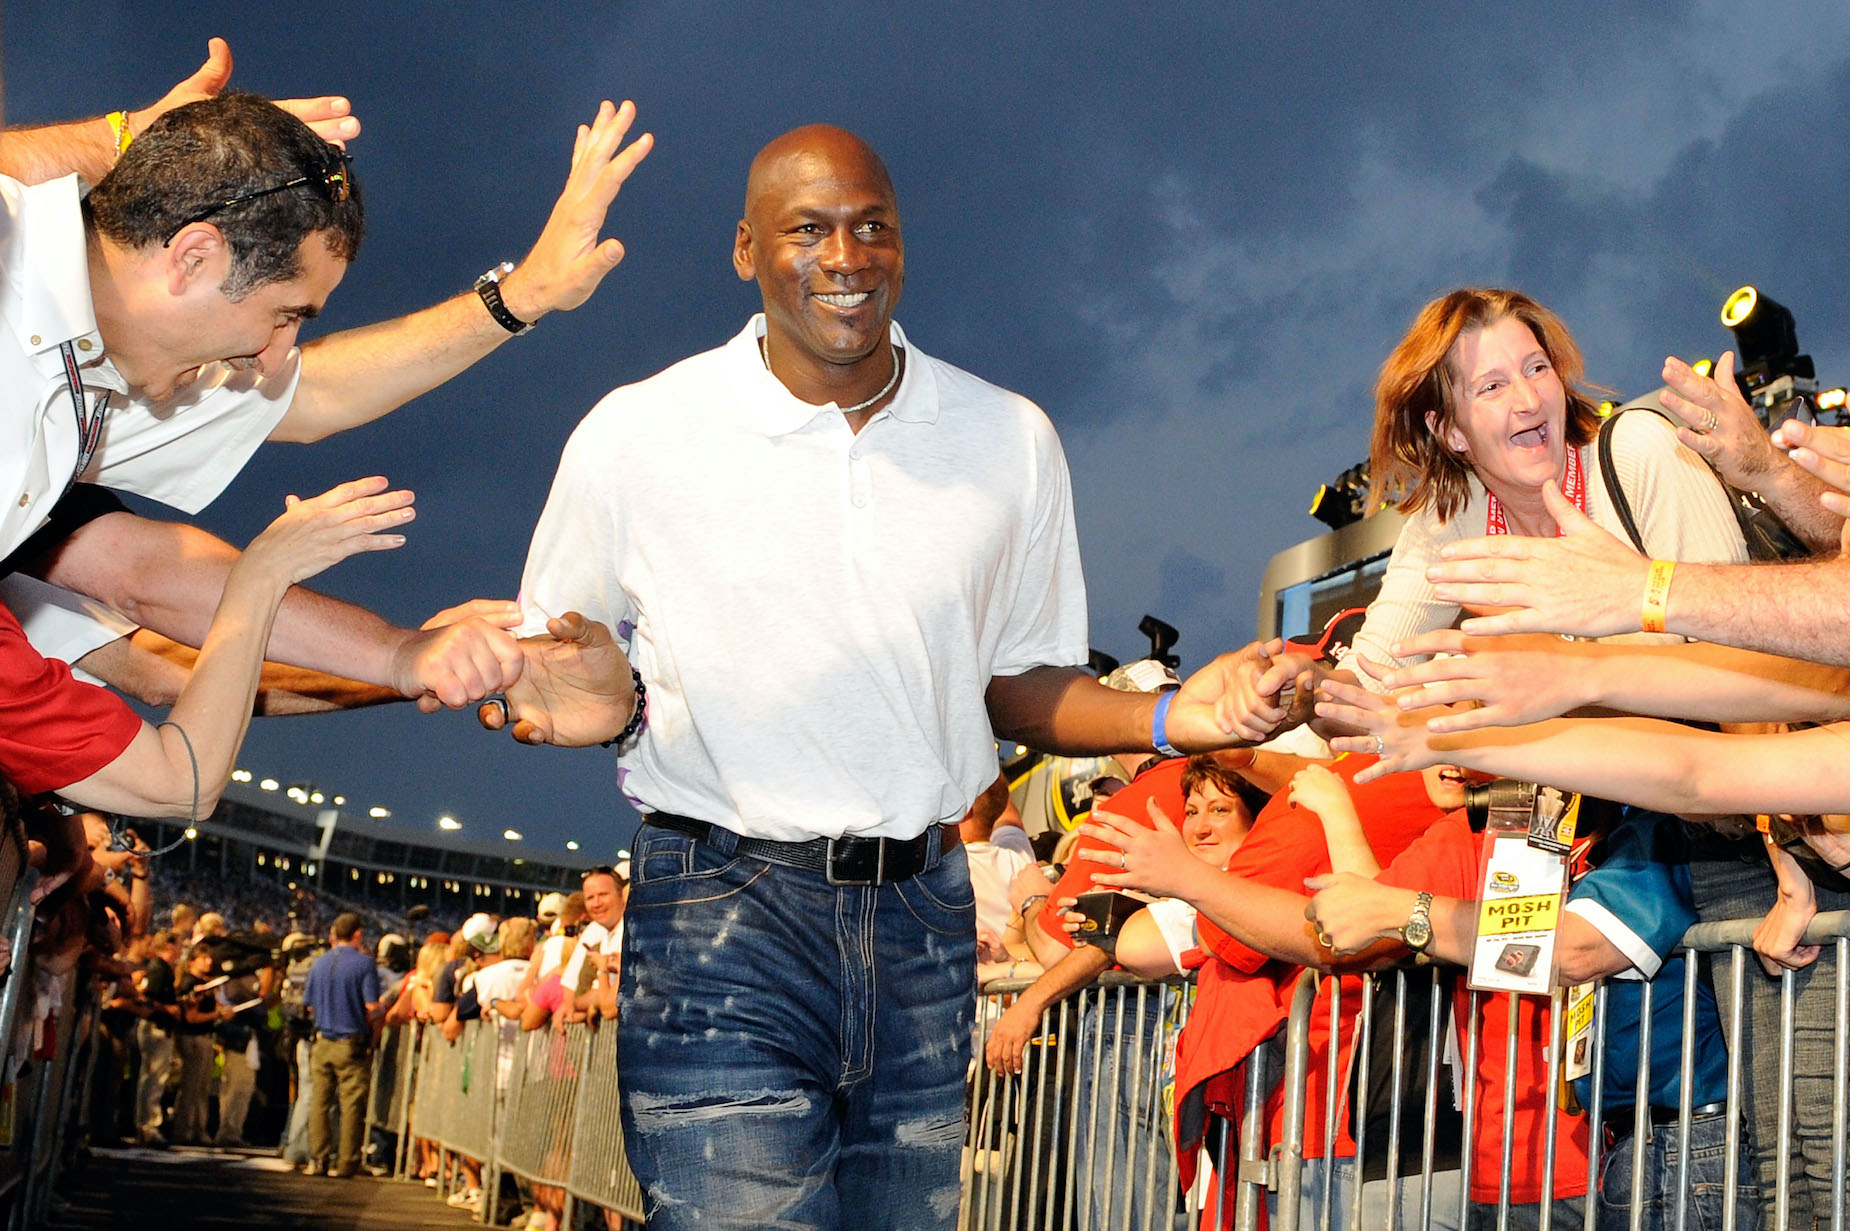 Michael Jordan high fives his fans at a 2010 NASCAR race.